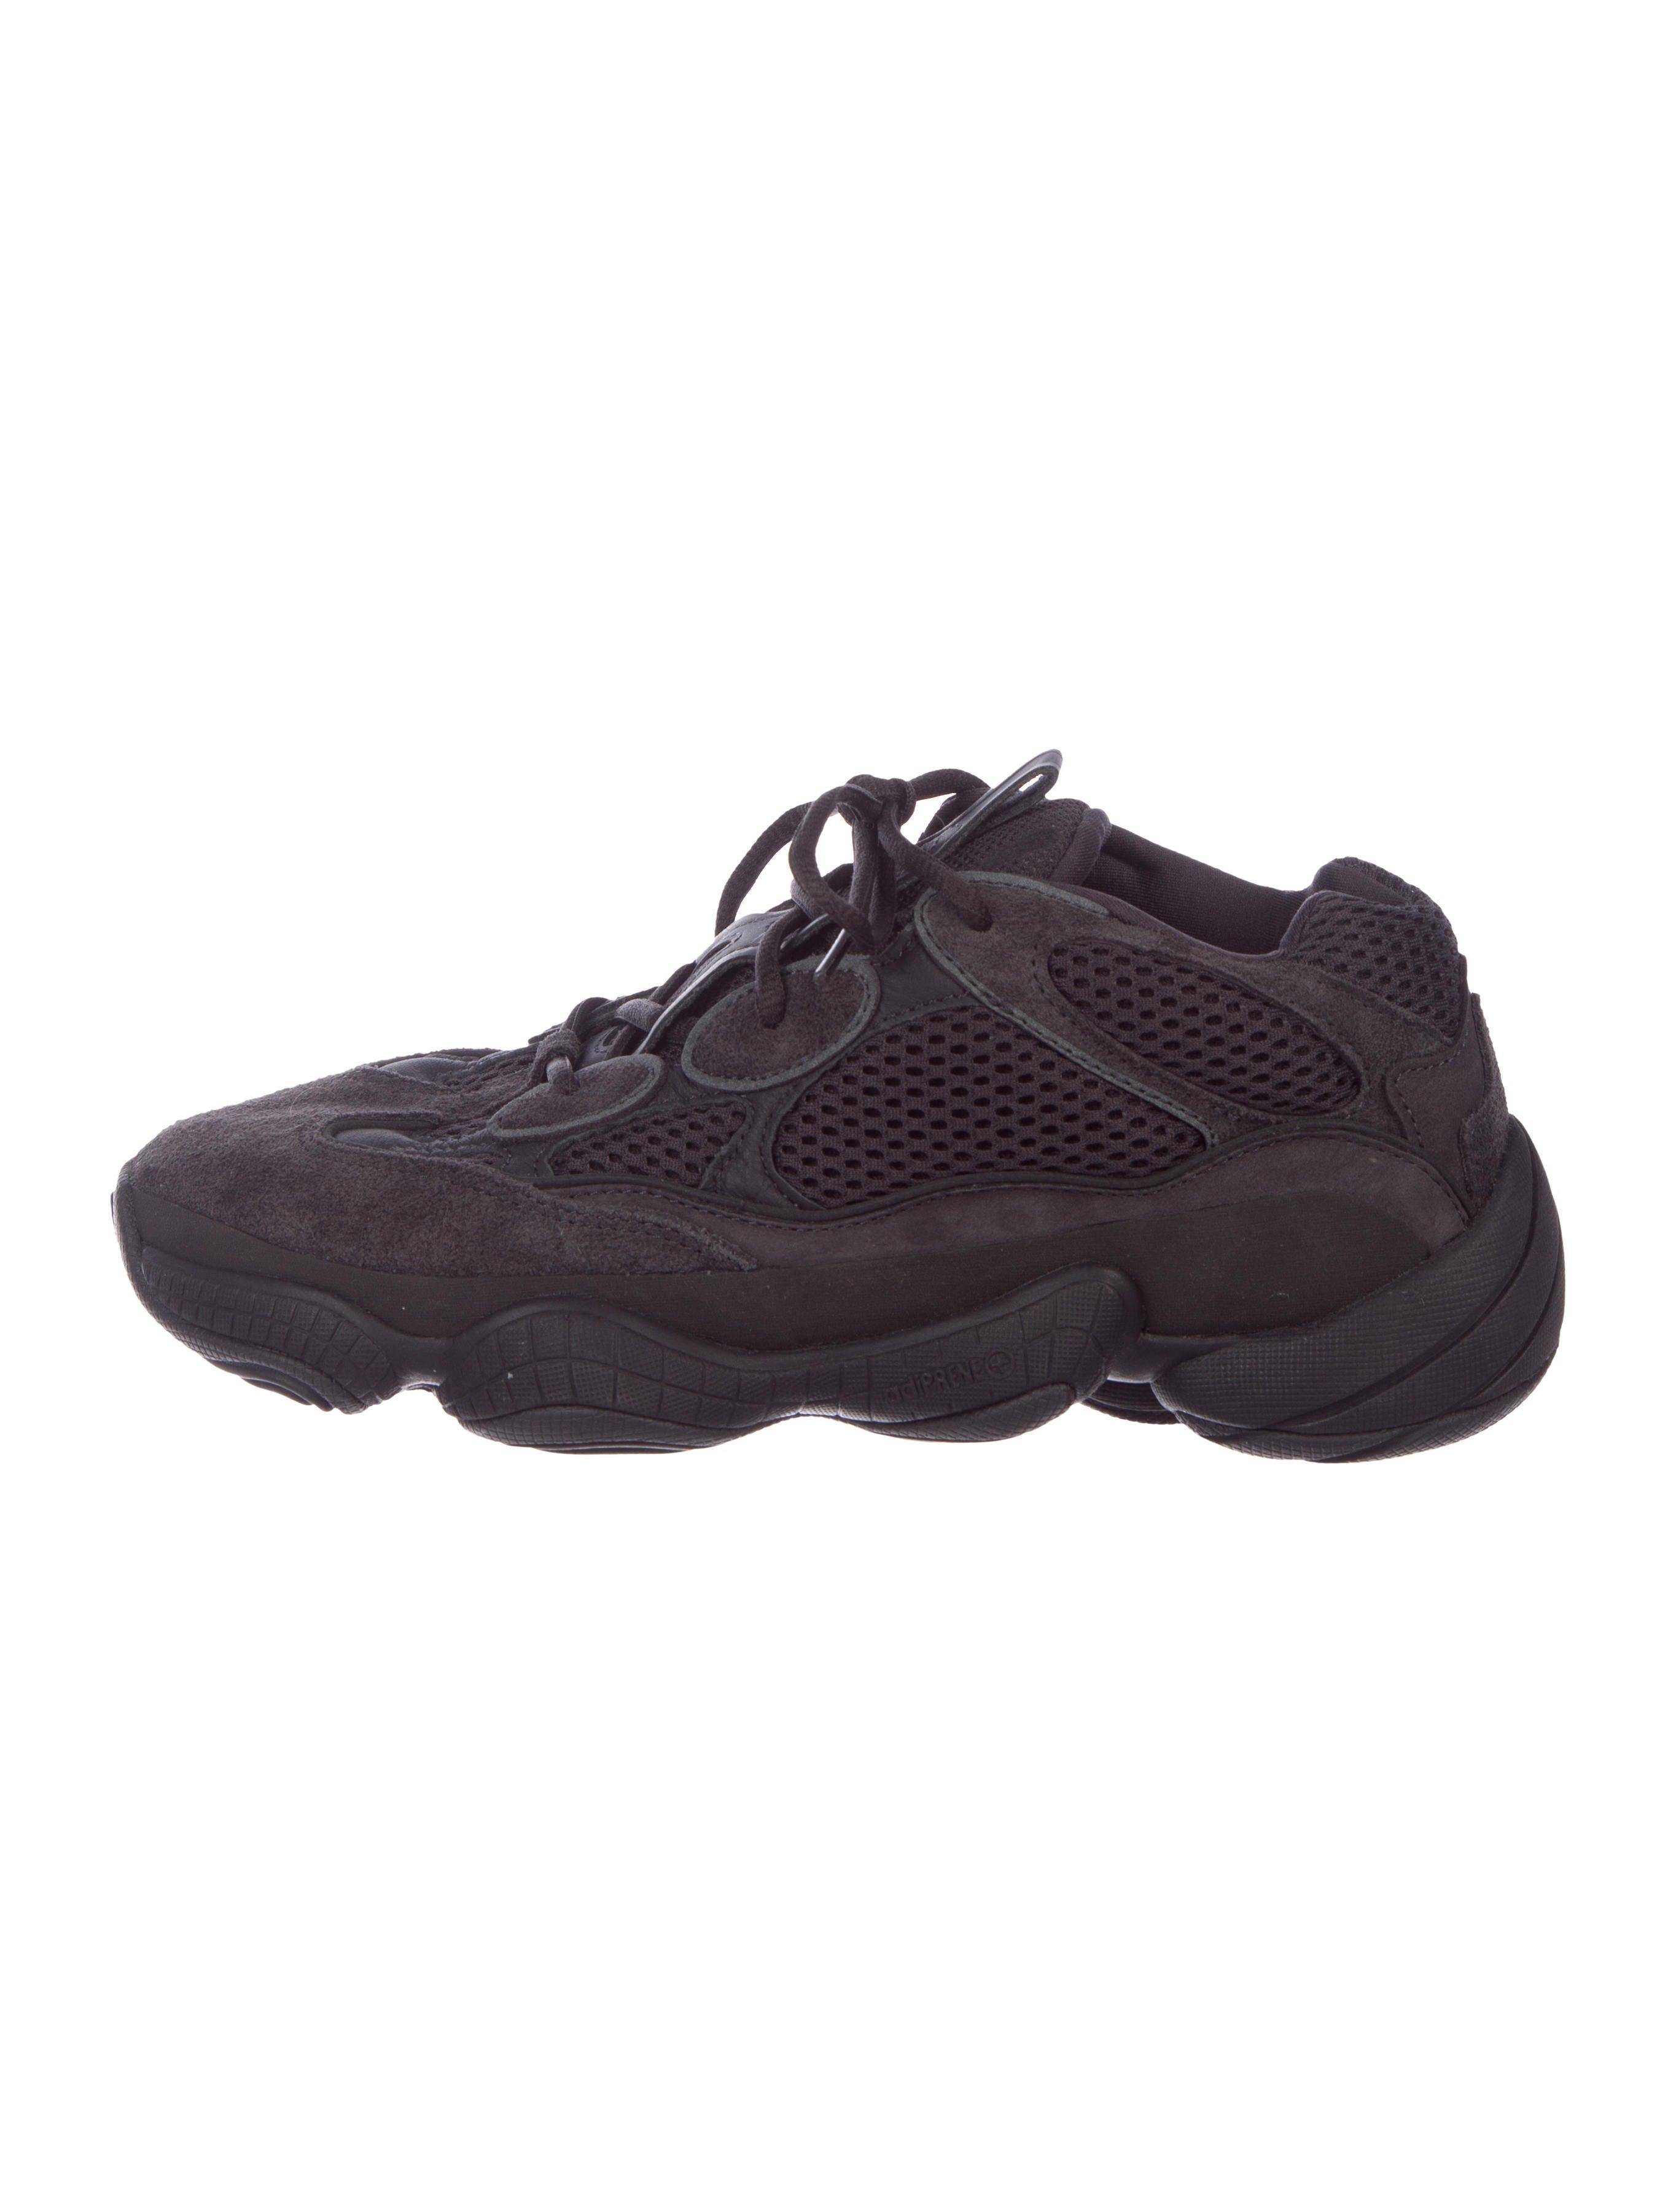 210af0ae1d816 Yeezy x adidas 2018 500 Desert Rat Utility Black Sneakers - Shoes ...